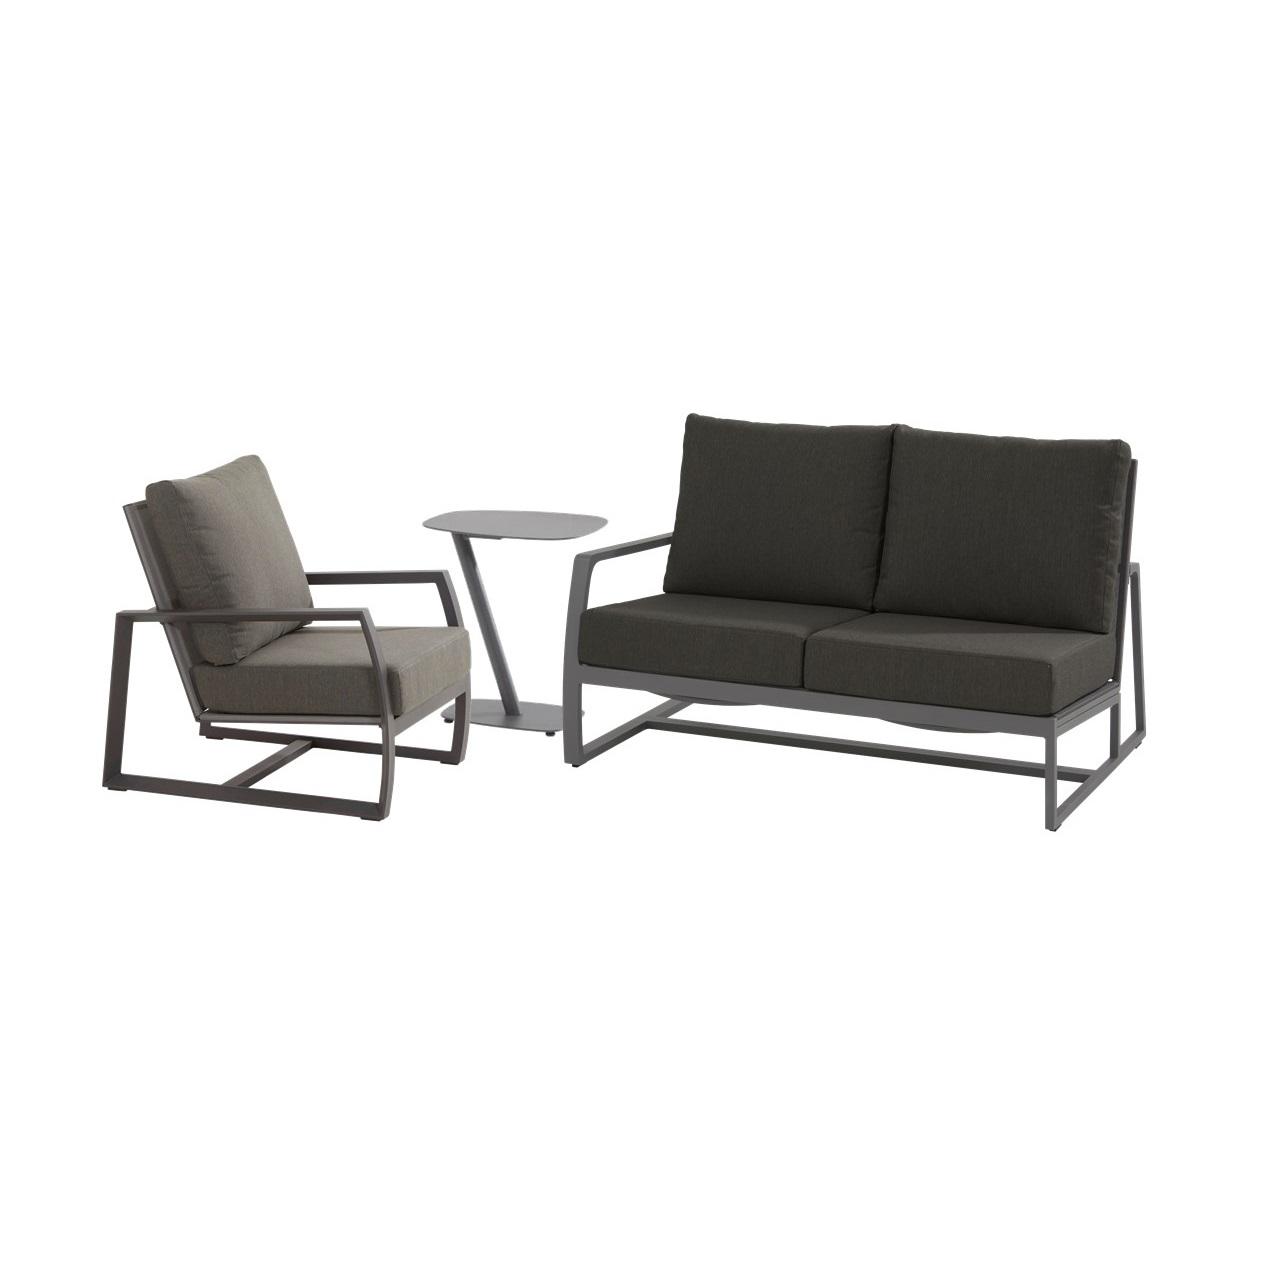 Taste Mauritius Modular Set W/Cushions - Slate Grey